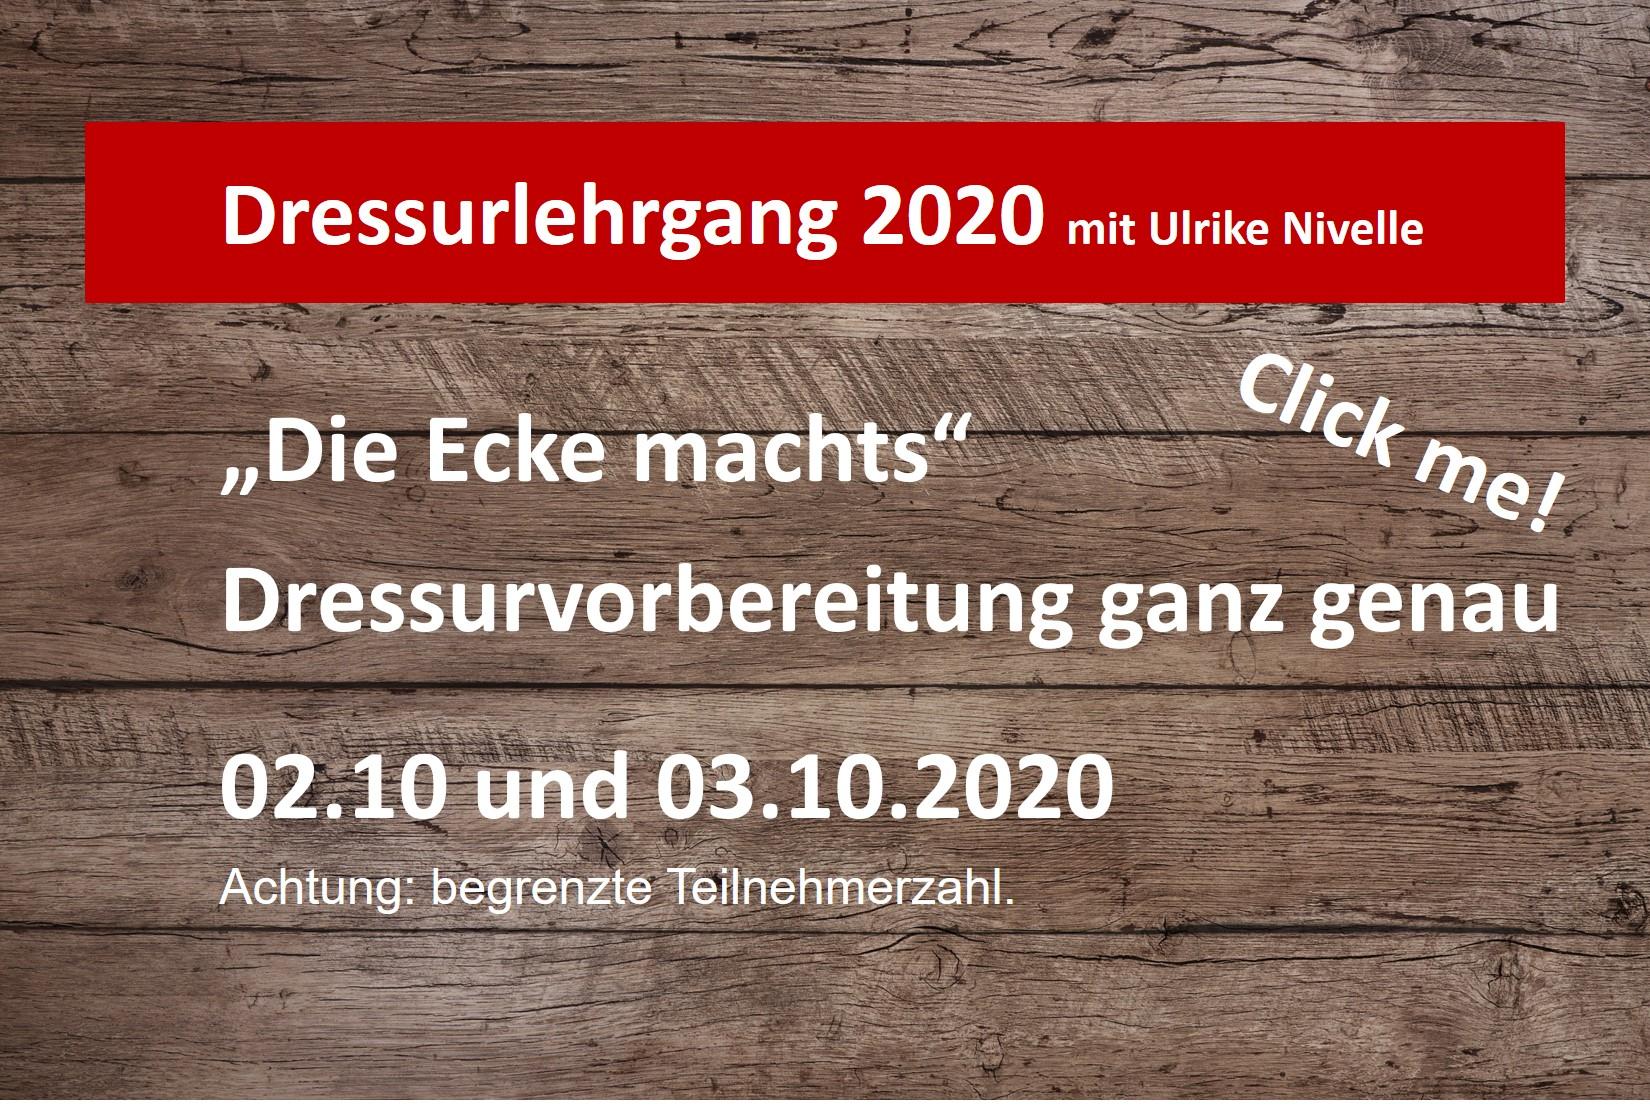 Dressurlehrgang 2020